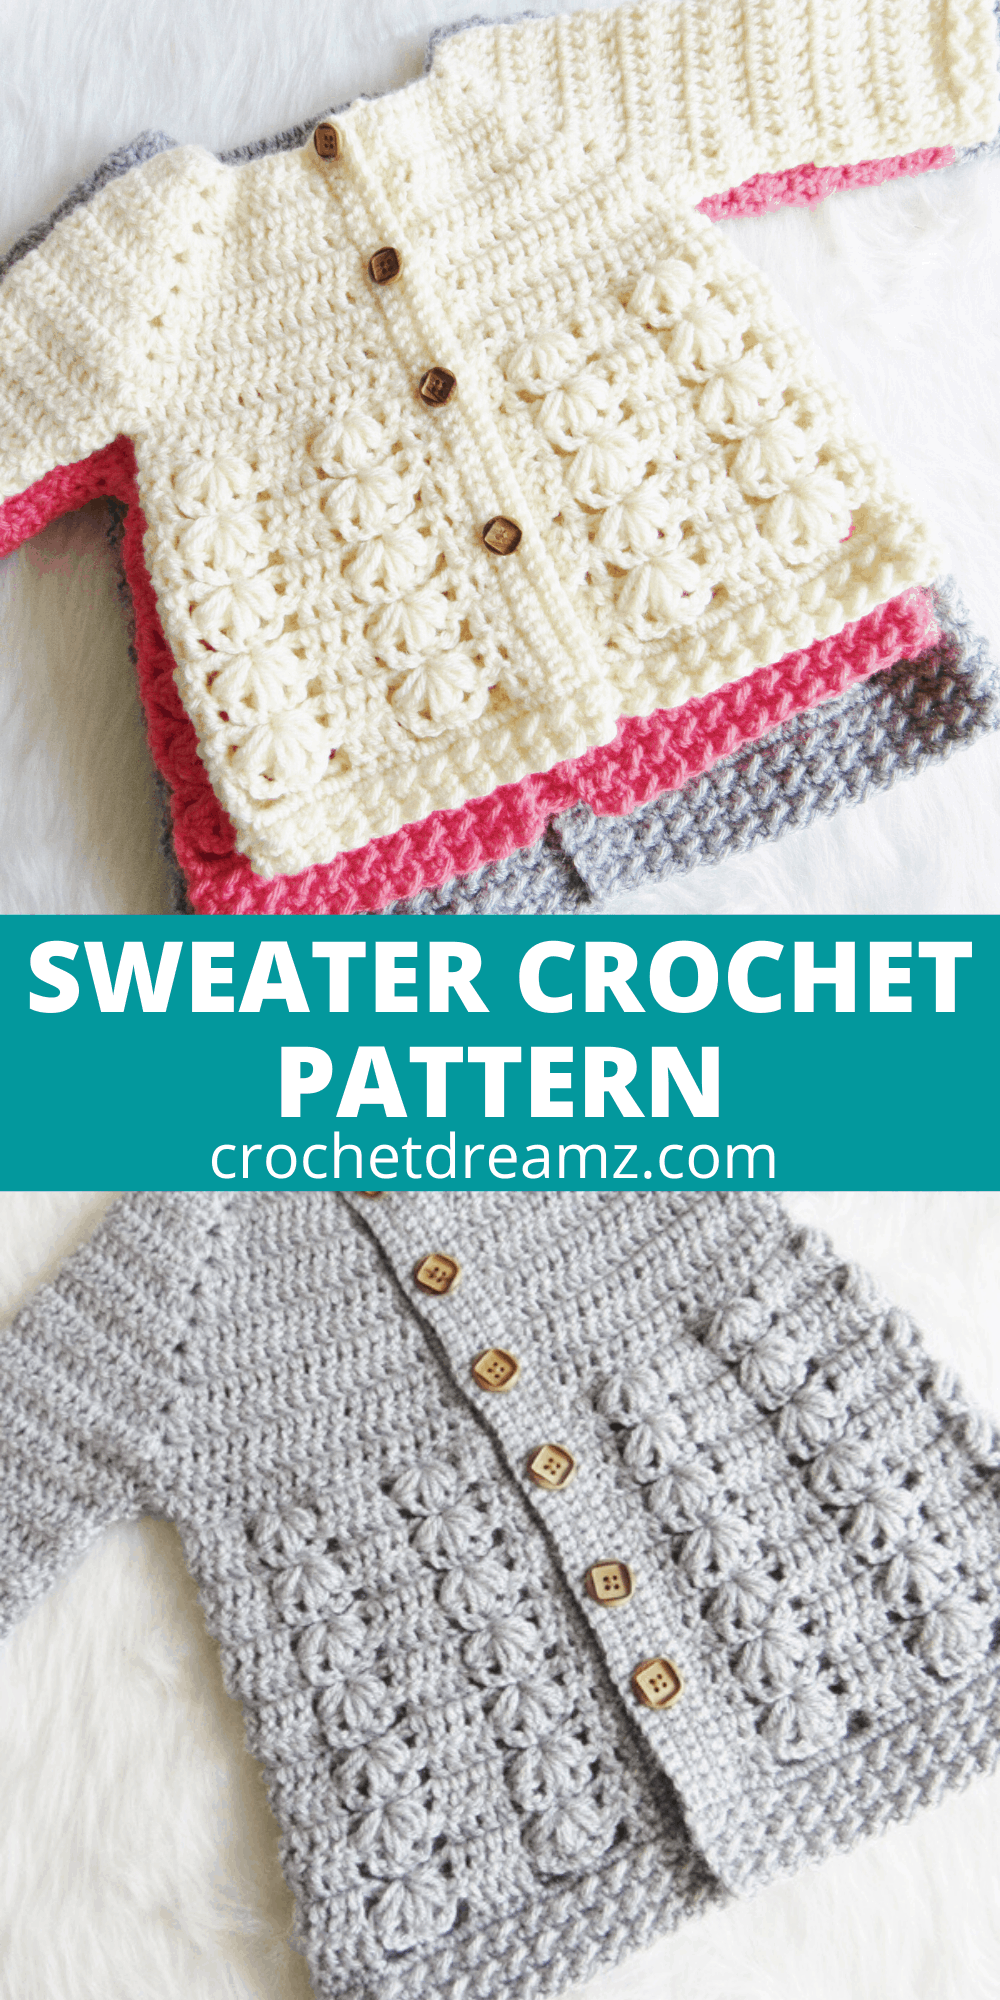 Textured Crochet Baby Sweater Pattern - Crochet Dreamz